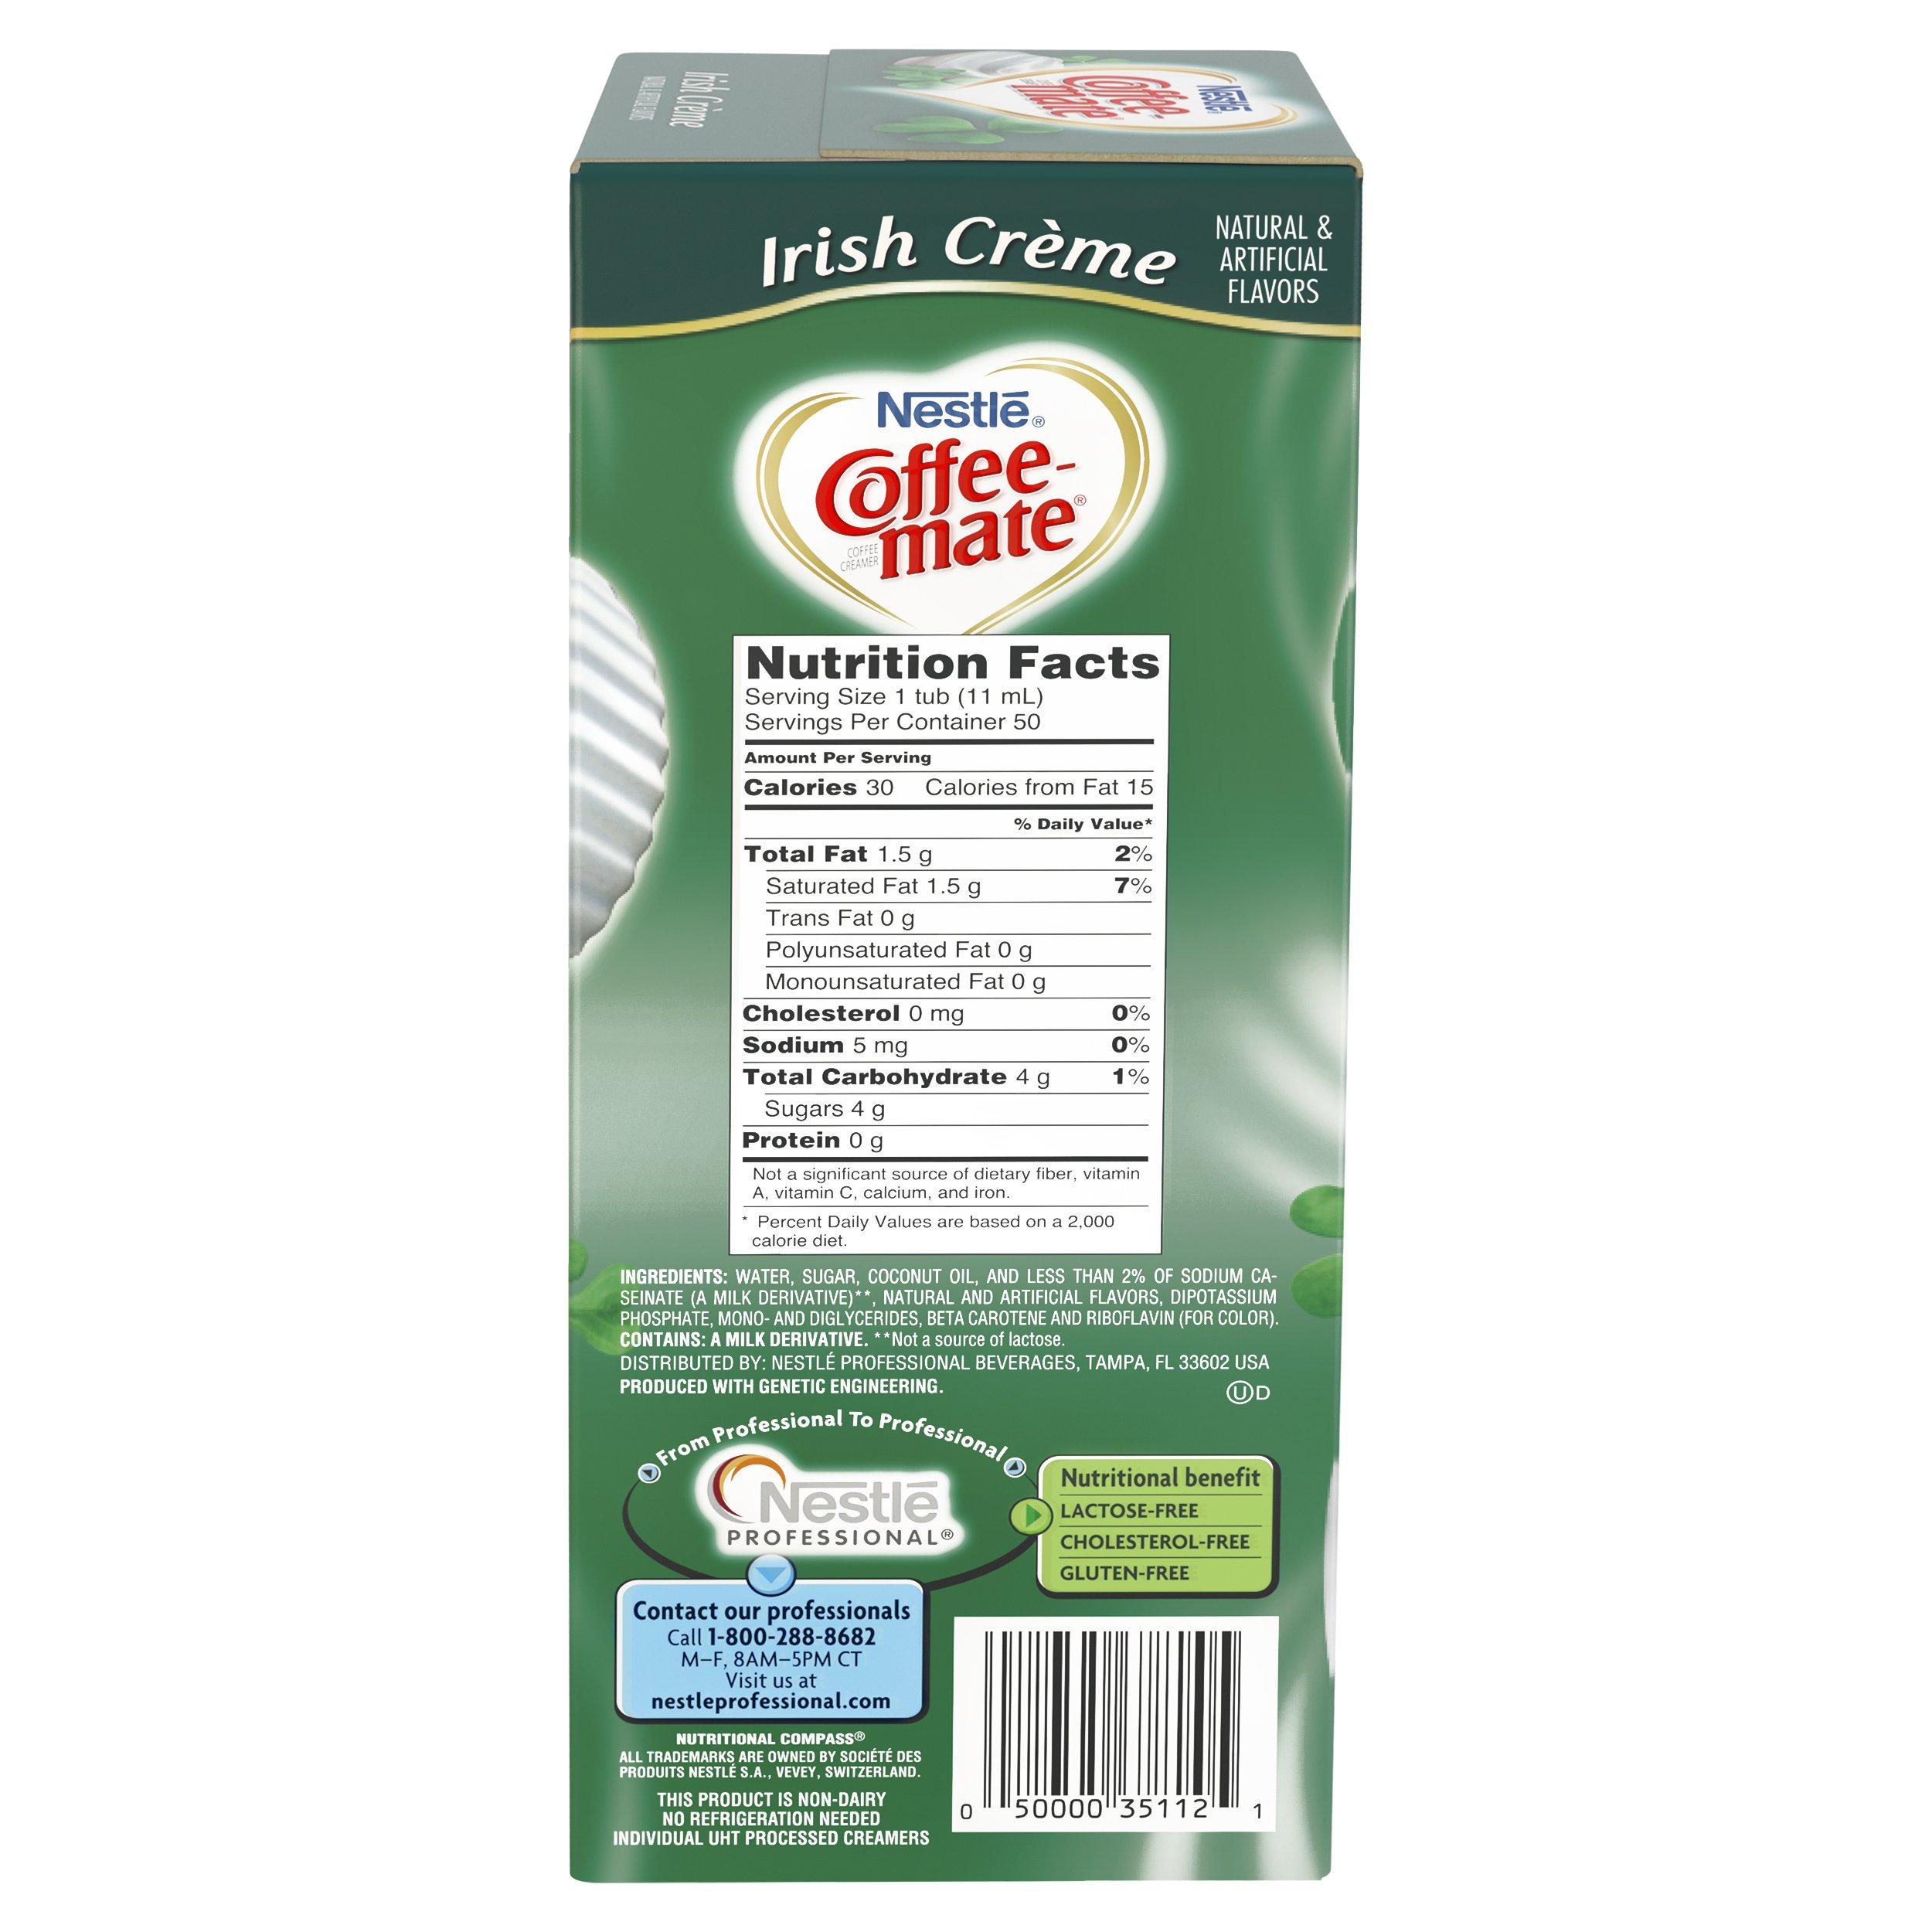 NESTLE COFFEE-MATE Coffee Creamer, Irish Creme, liquid creamer singles, Pack of 200 by Nestle Coffee Mate (Image #3)